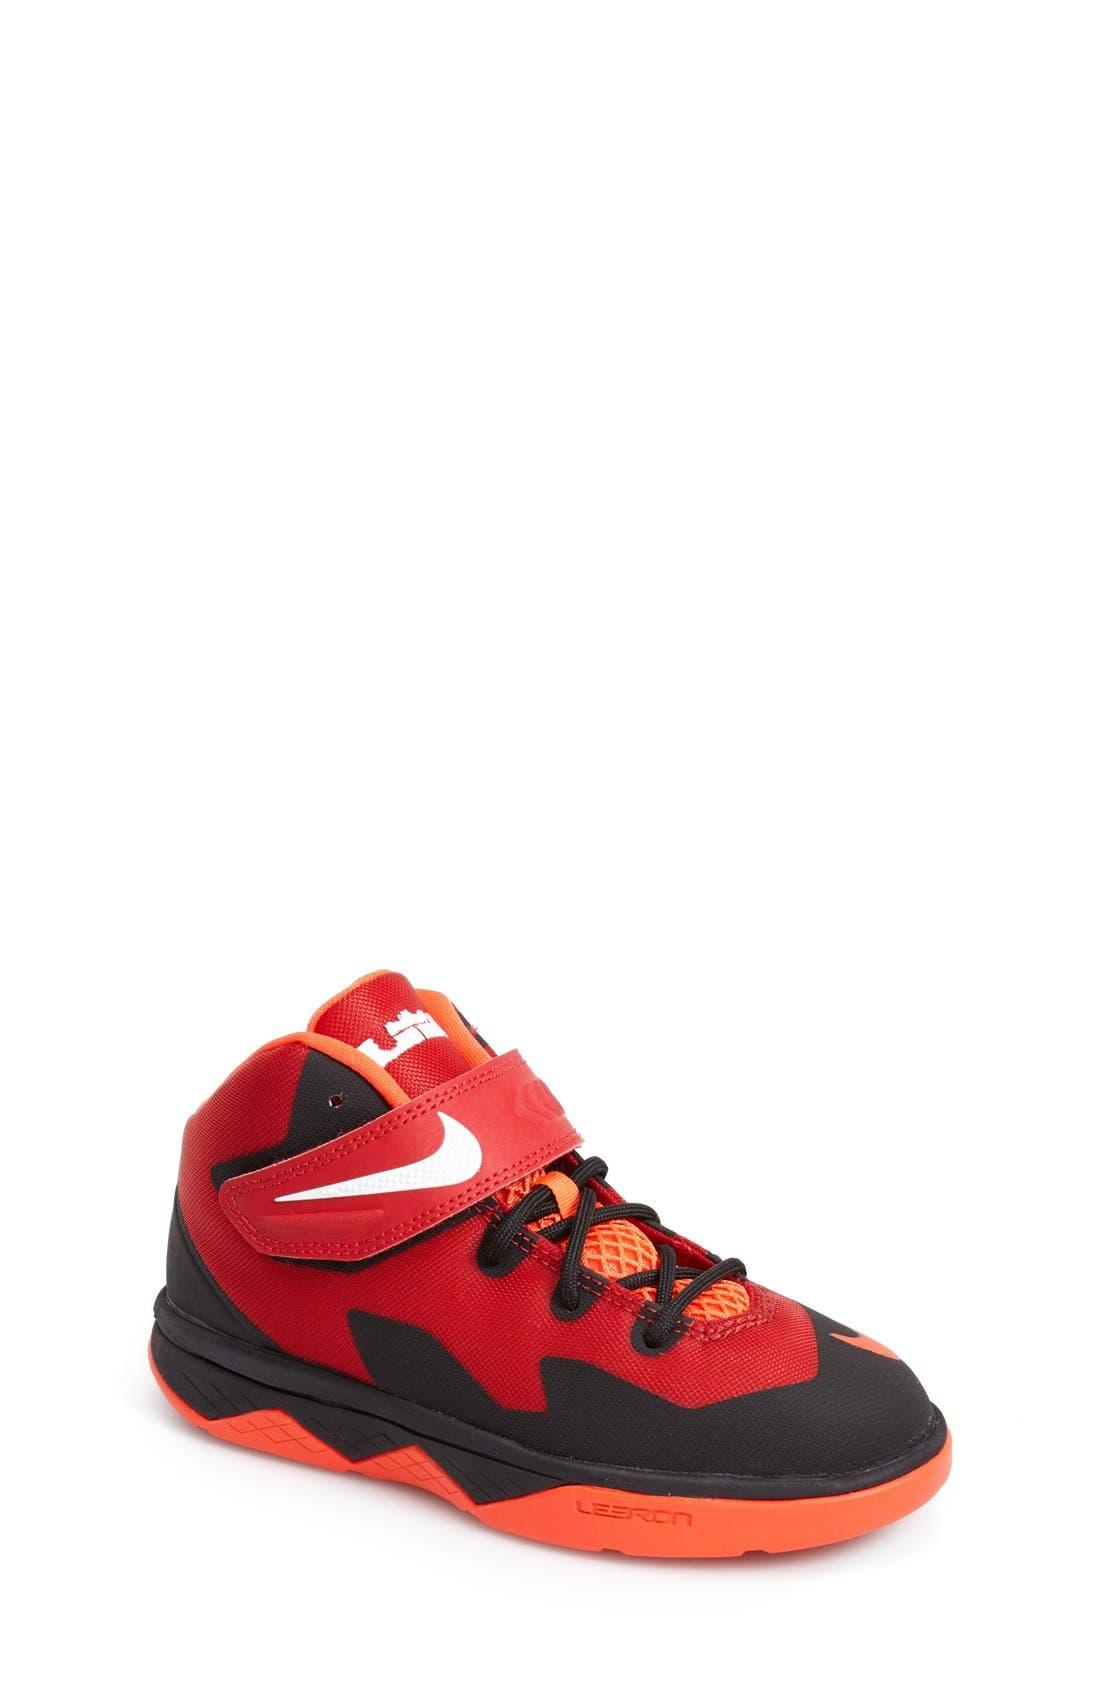 nike zoom lebron soldier viii basketball shoe toddler